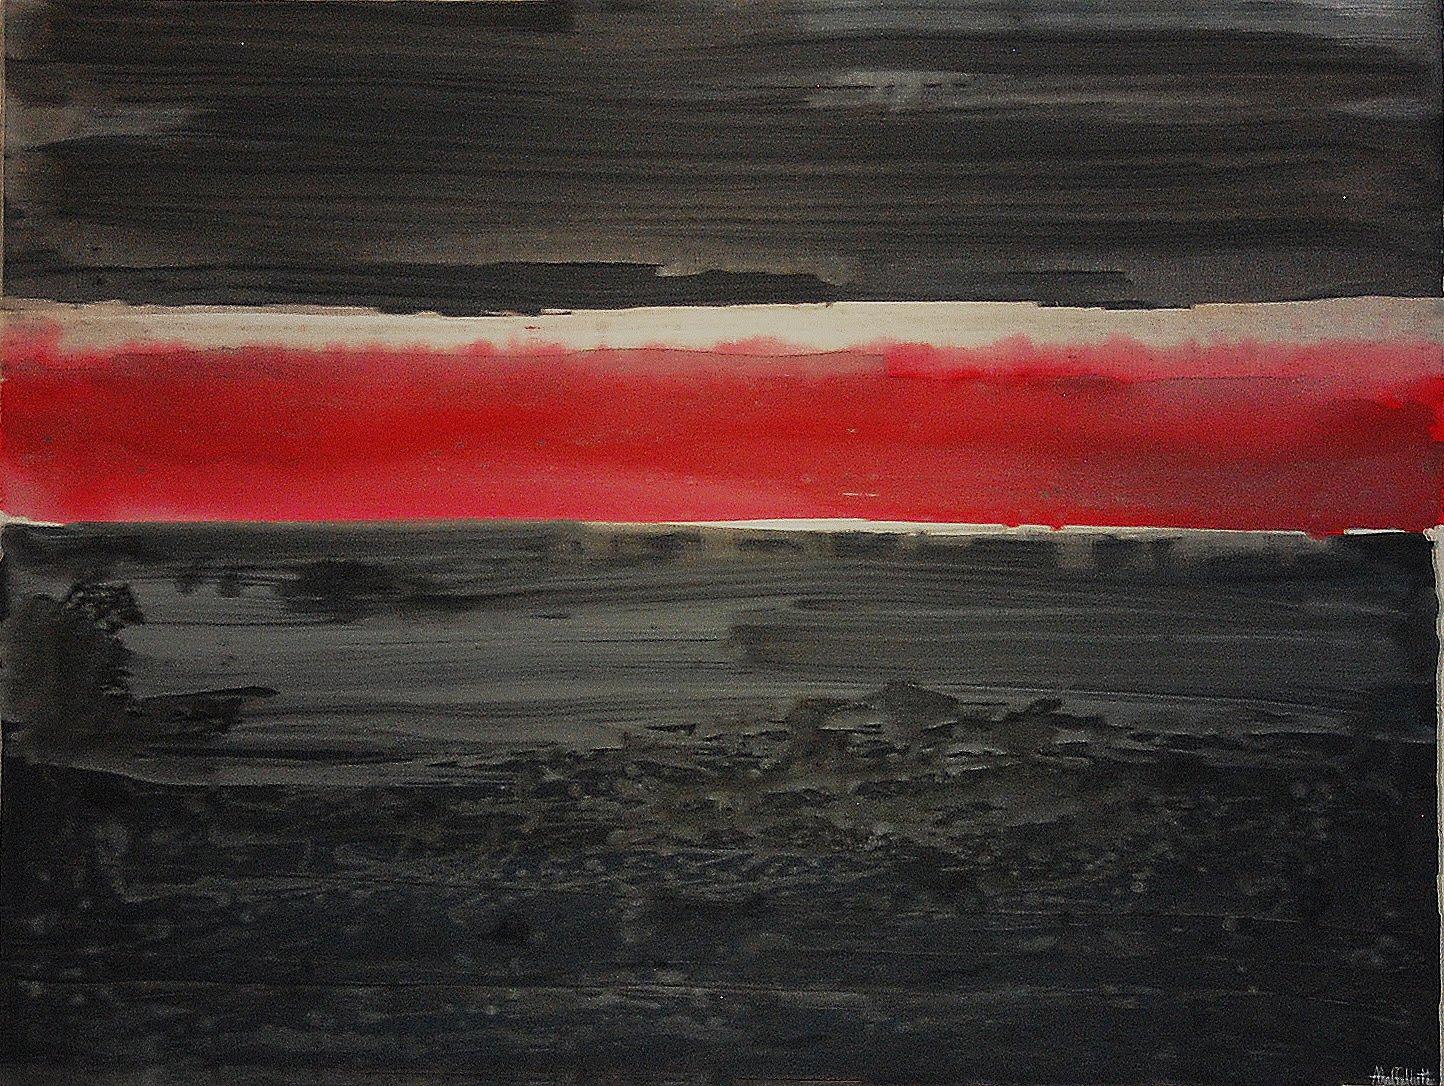 167. Untitled. 91x121cm